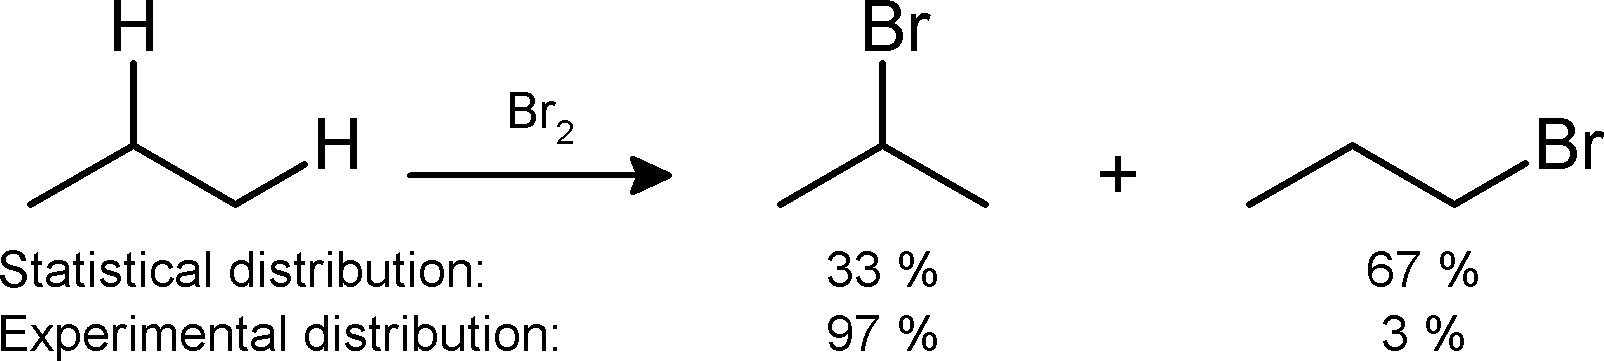 Monobromination of propane